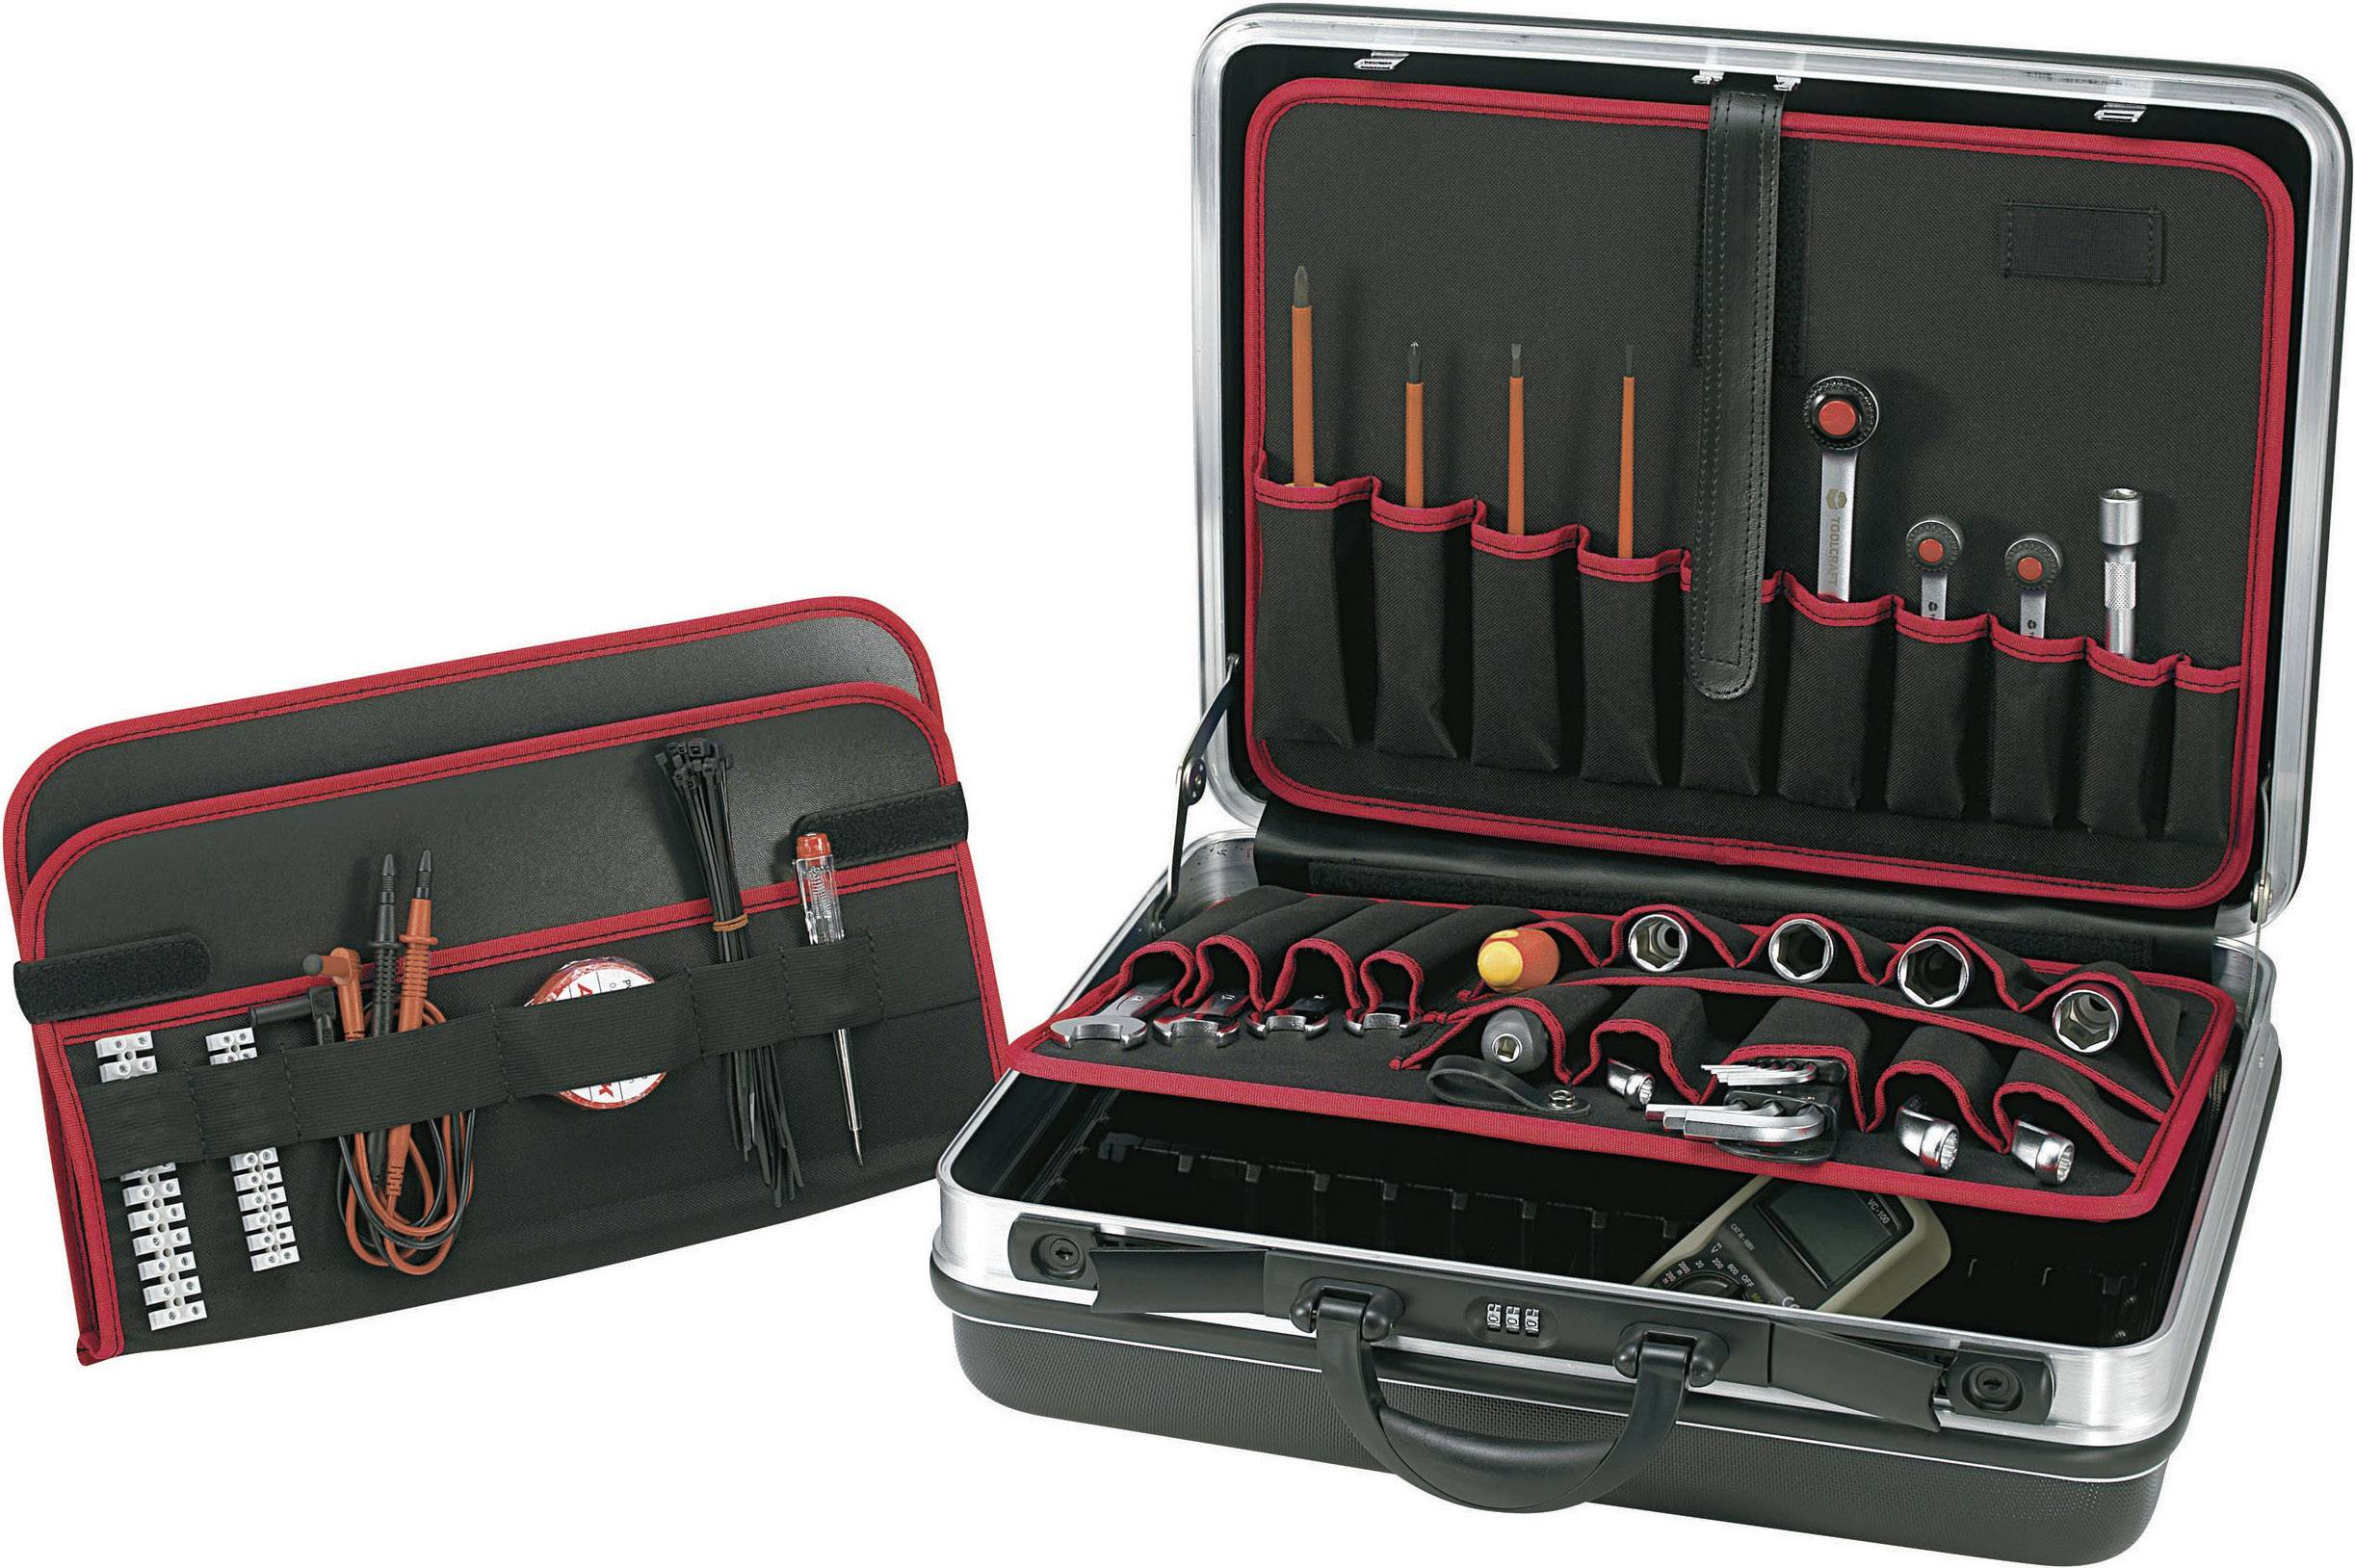 Kufrík na náradie TOOLCRAFT 821398, (d x š x v) 490 x 420 x 185 mm, bez náradia